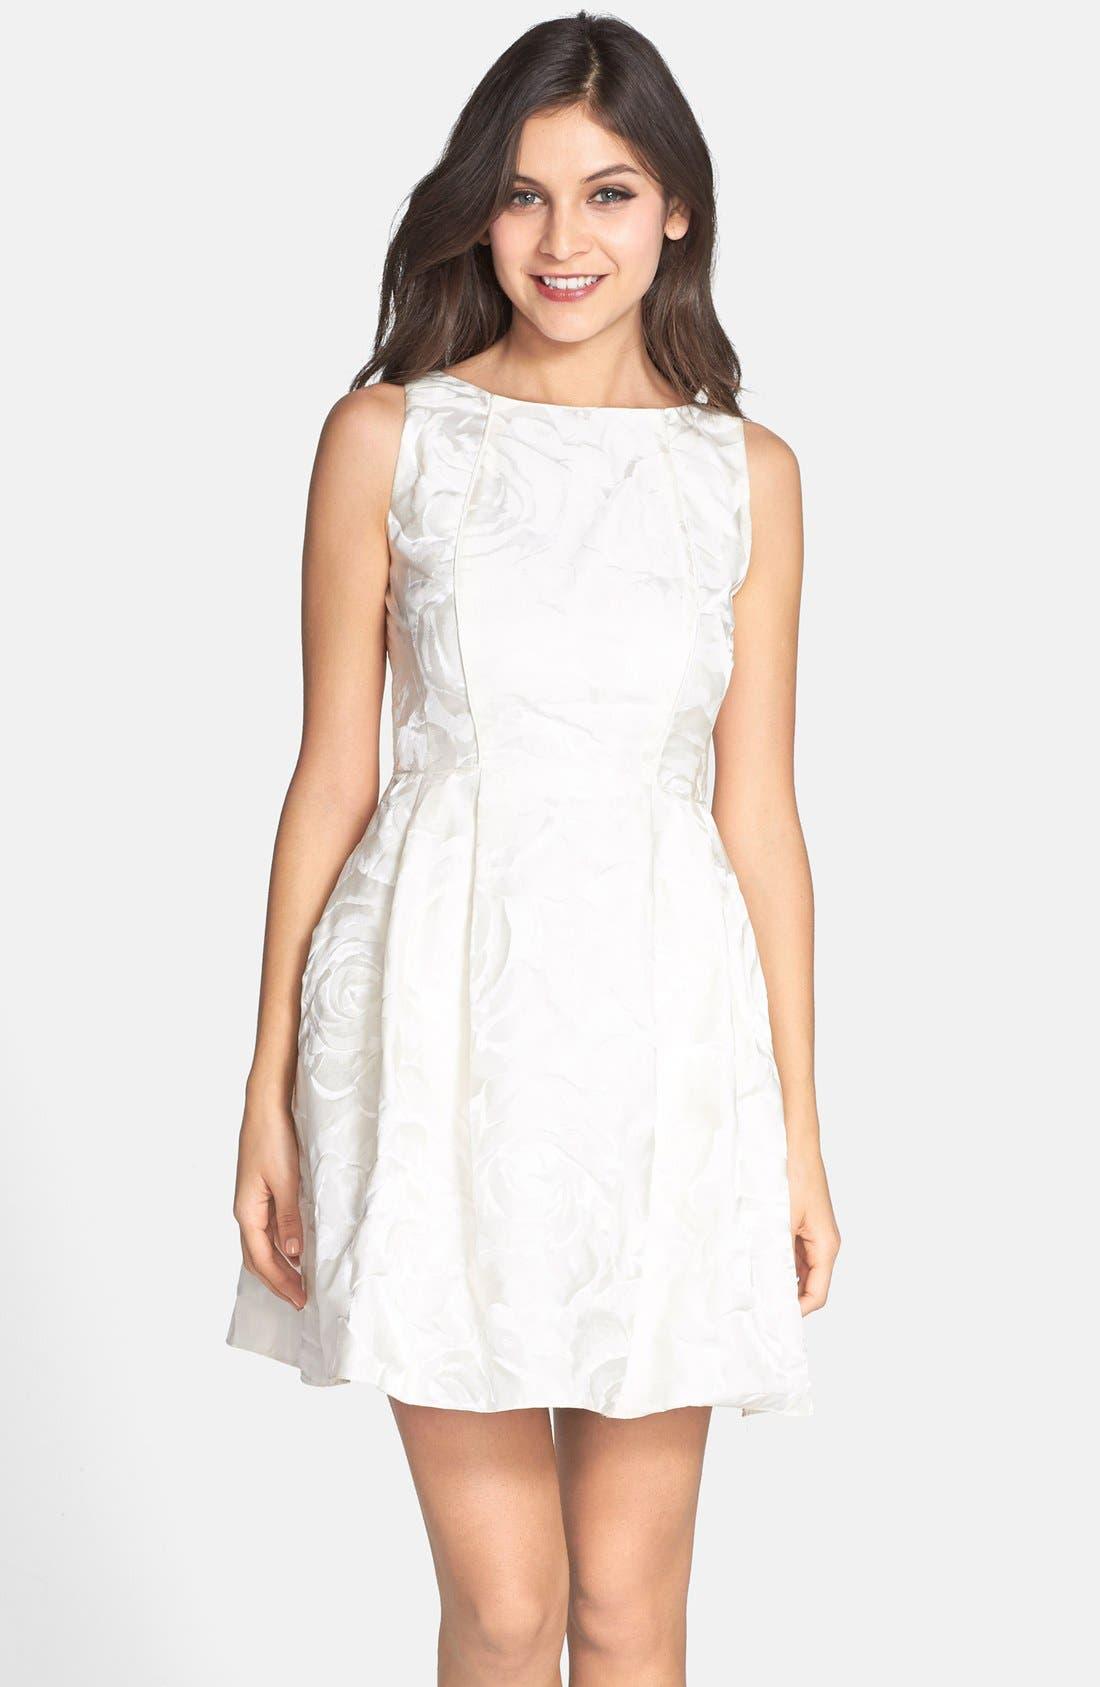 Alternate Image 1 Selected - Aidan by Aidan Mattox Jacquard Sleeveless Fit & Flare Dress